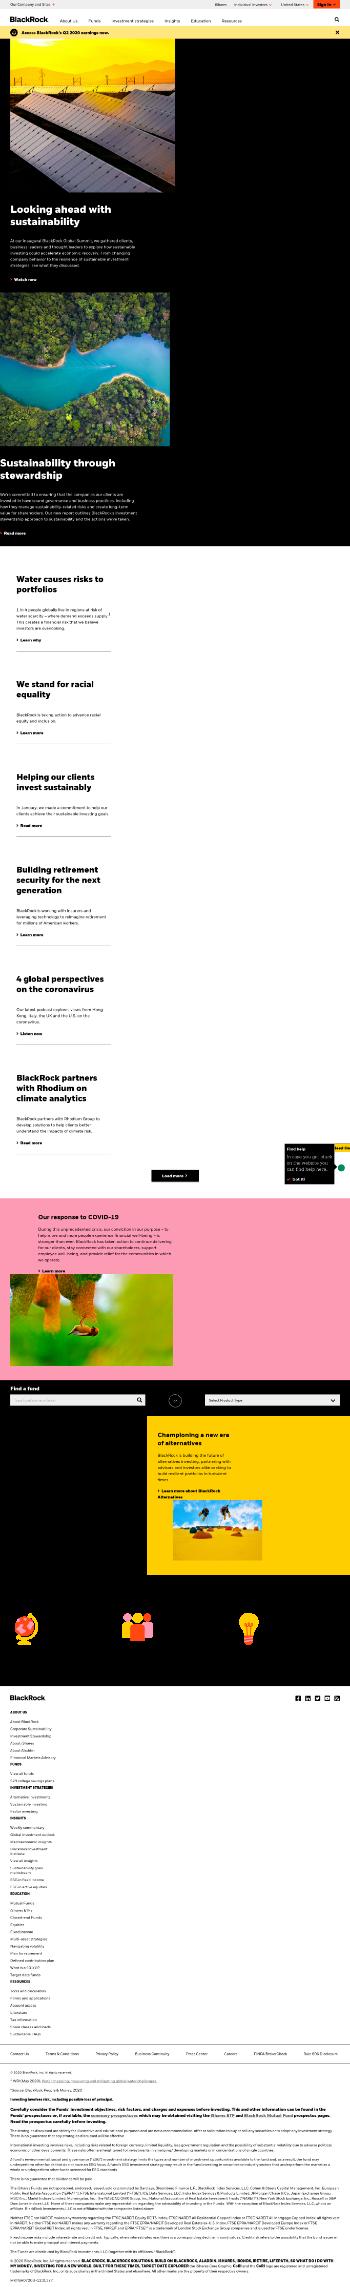 BlackRock Income Trust, Inc. Website Screenshot